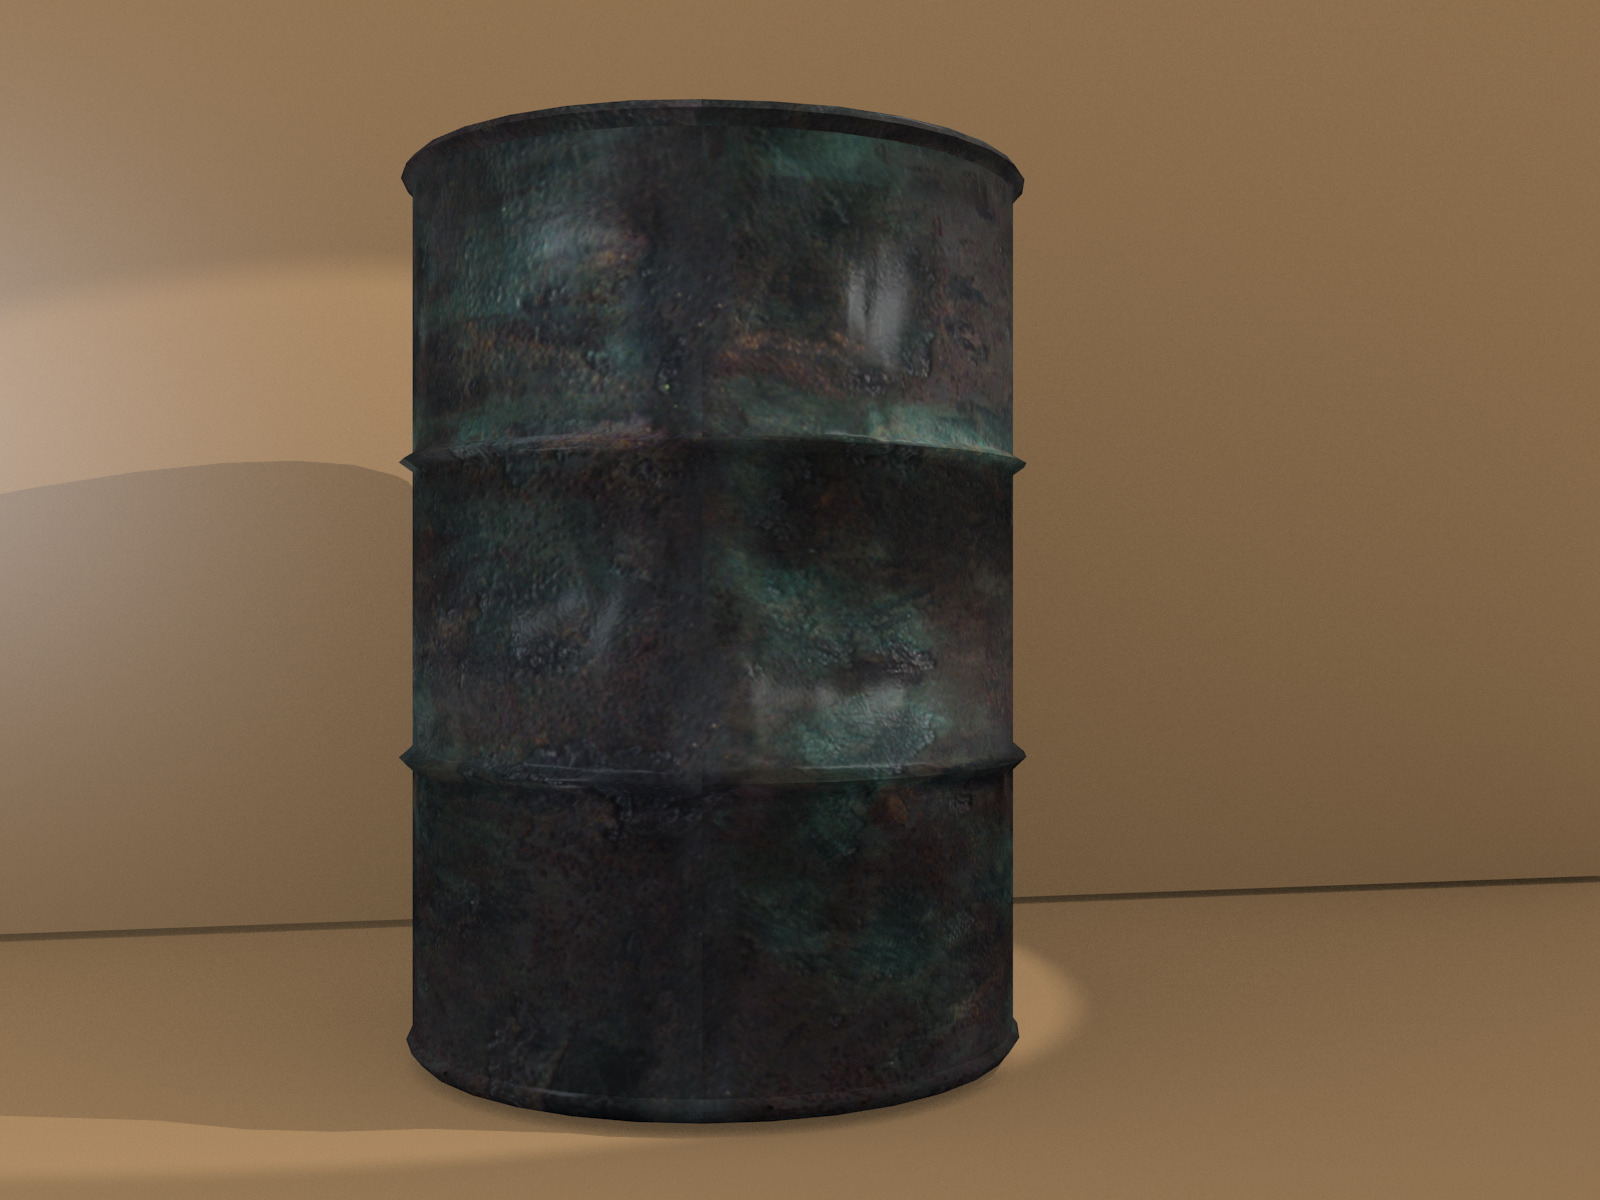 rusty barrel - 3DOcean Item for Sale